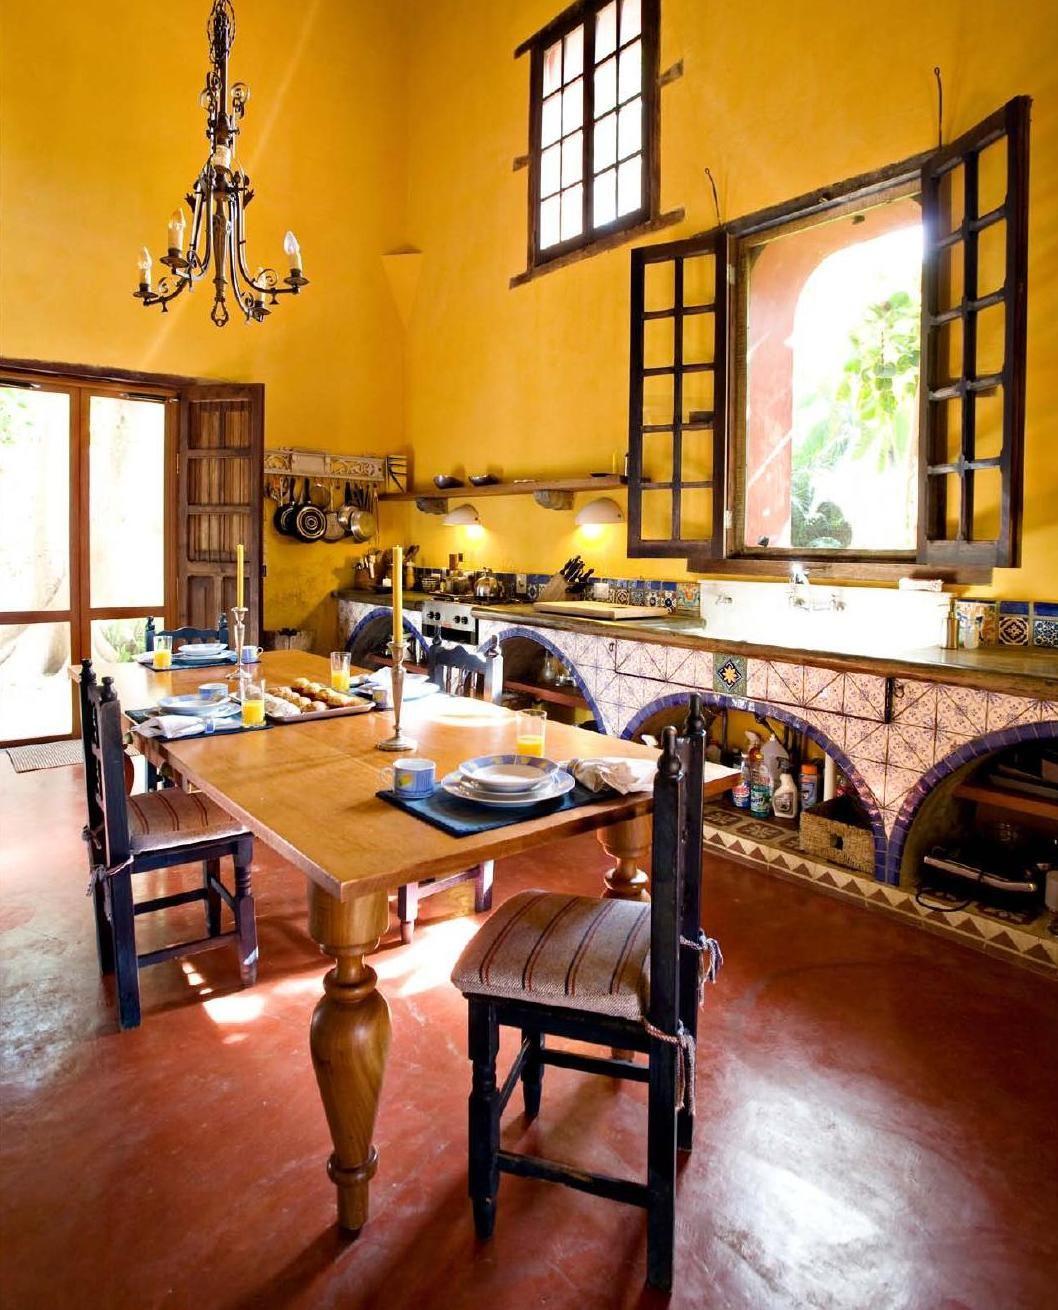 Casas terrenos edici n 47 cocinas mexicanas mexicanos for Decoracion rustica mexicana